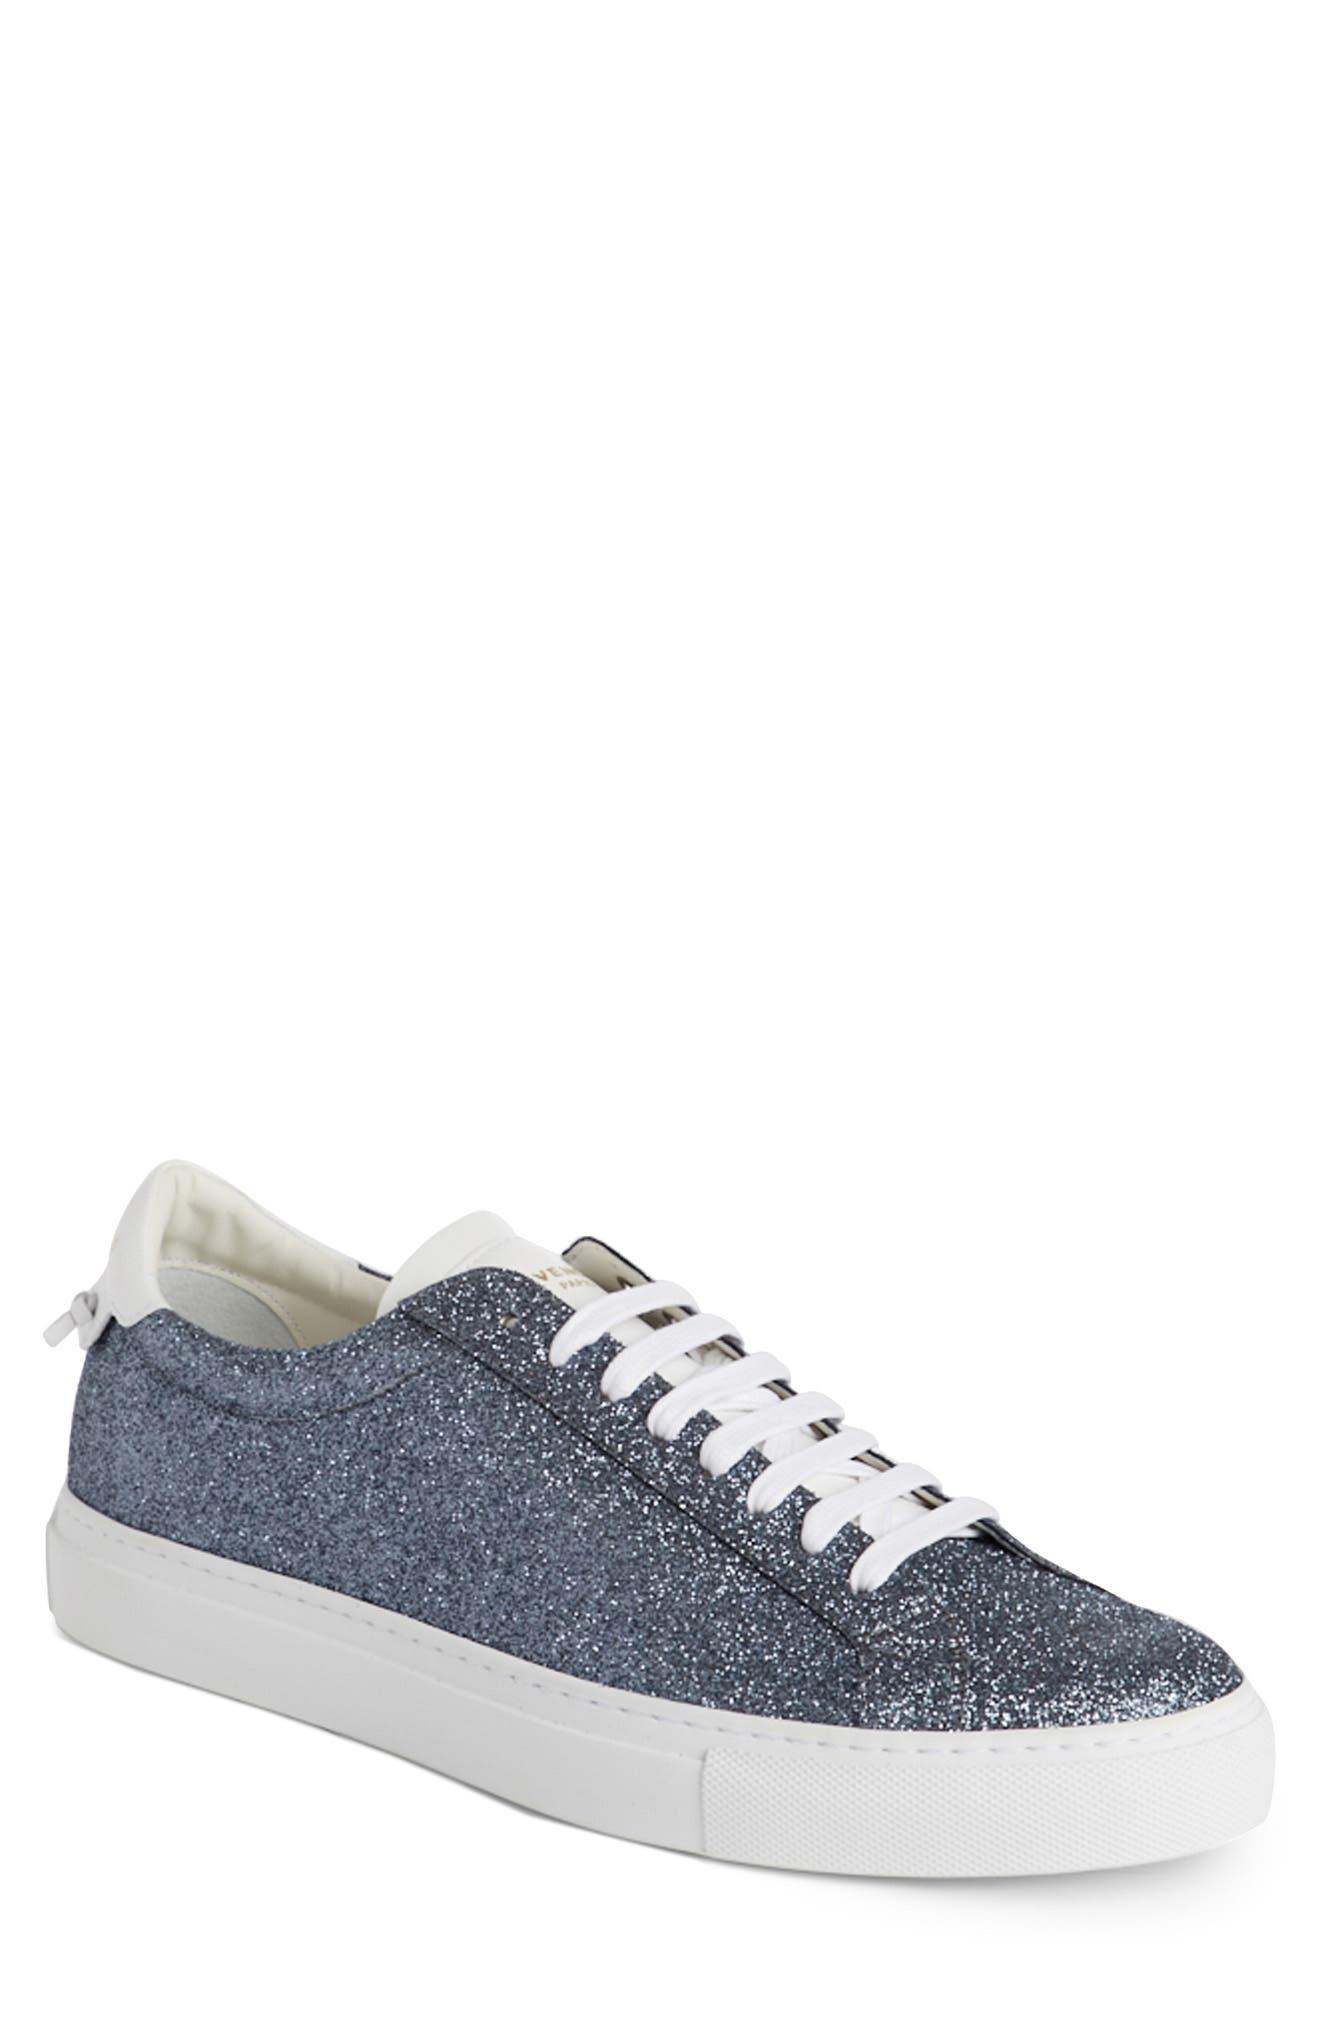 Urban Knots Glitter Sneaker,                         Main,                         color, Grey